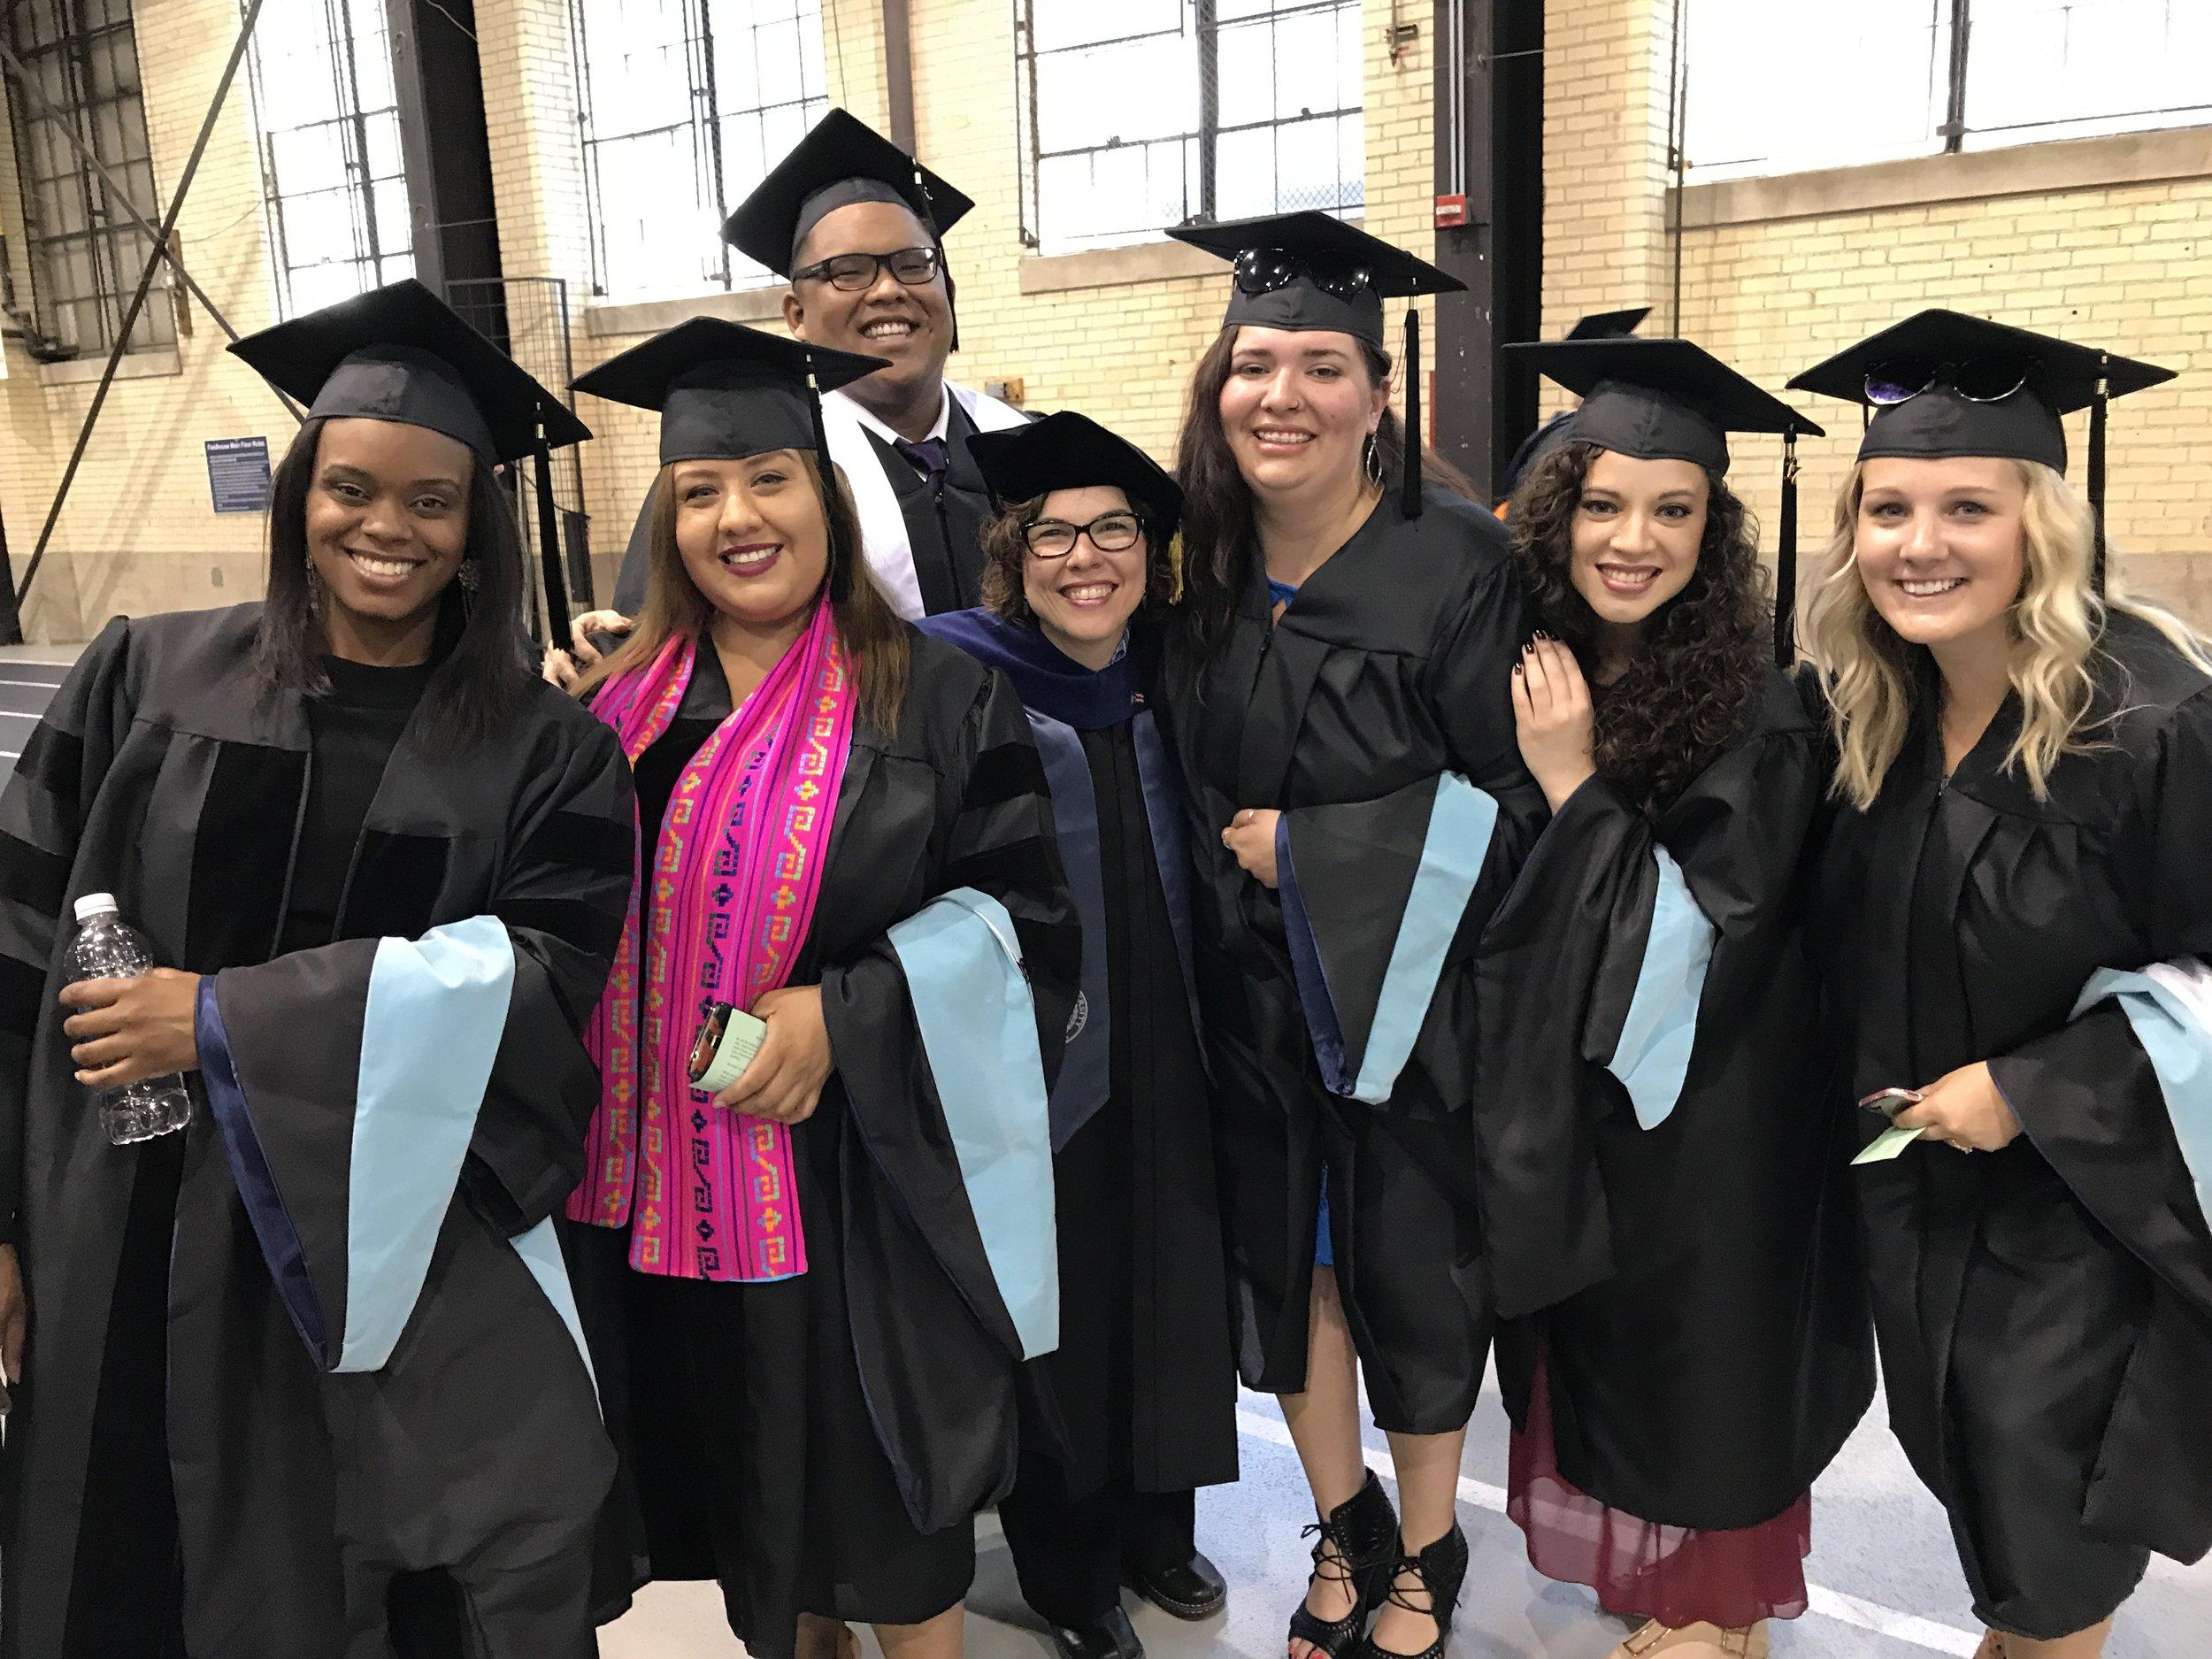 Graduation!!! Dr. Odessia Knowles, Dr. Marsha Tafoya Ávila, Education Specialist Lesther A. Papa, Dr. Domenech Rodríguez, Master Alexandra K. Reveles, Master Jeisianne Rosario Colón, Master Nicole Feigt.